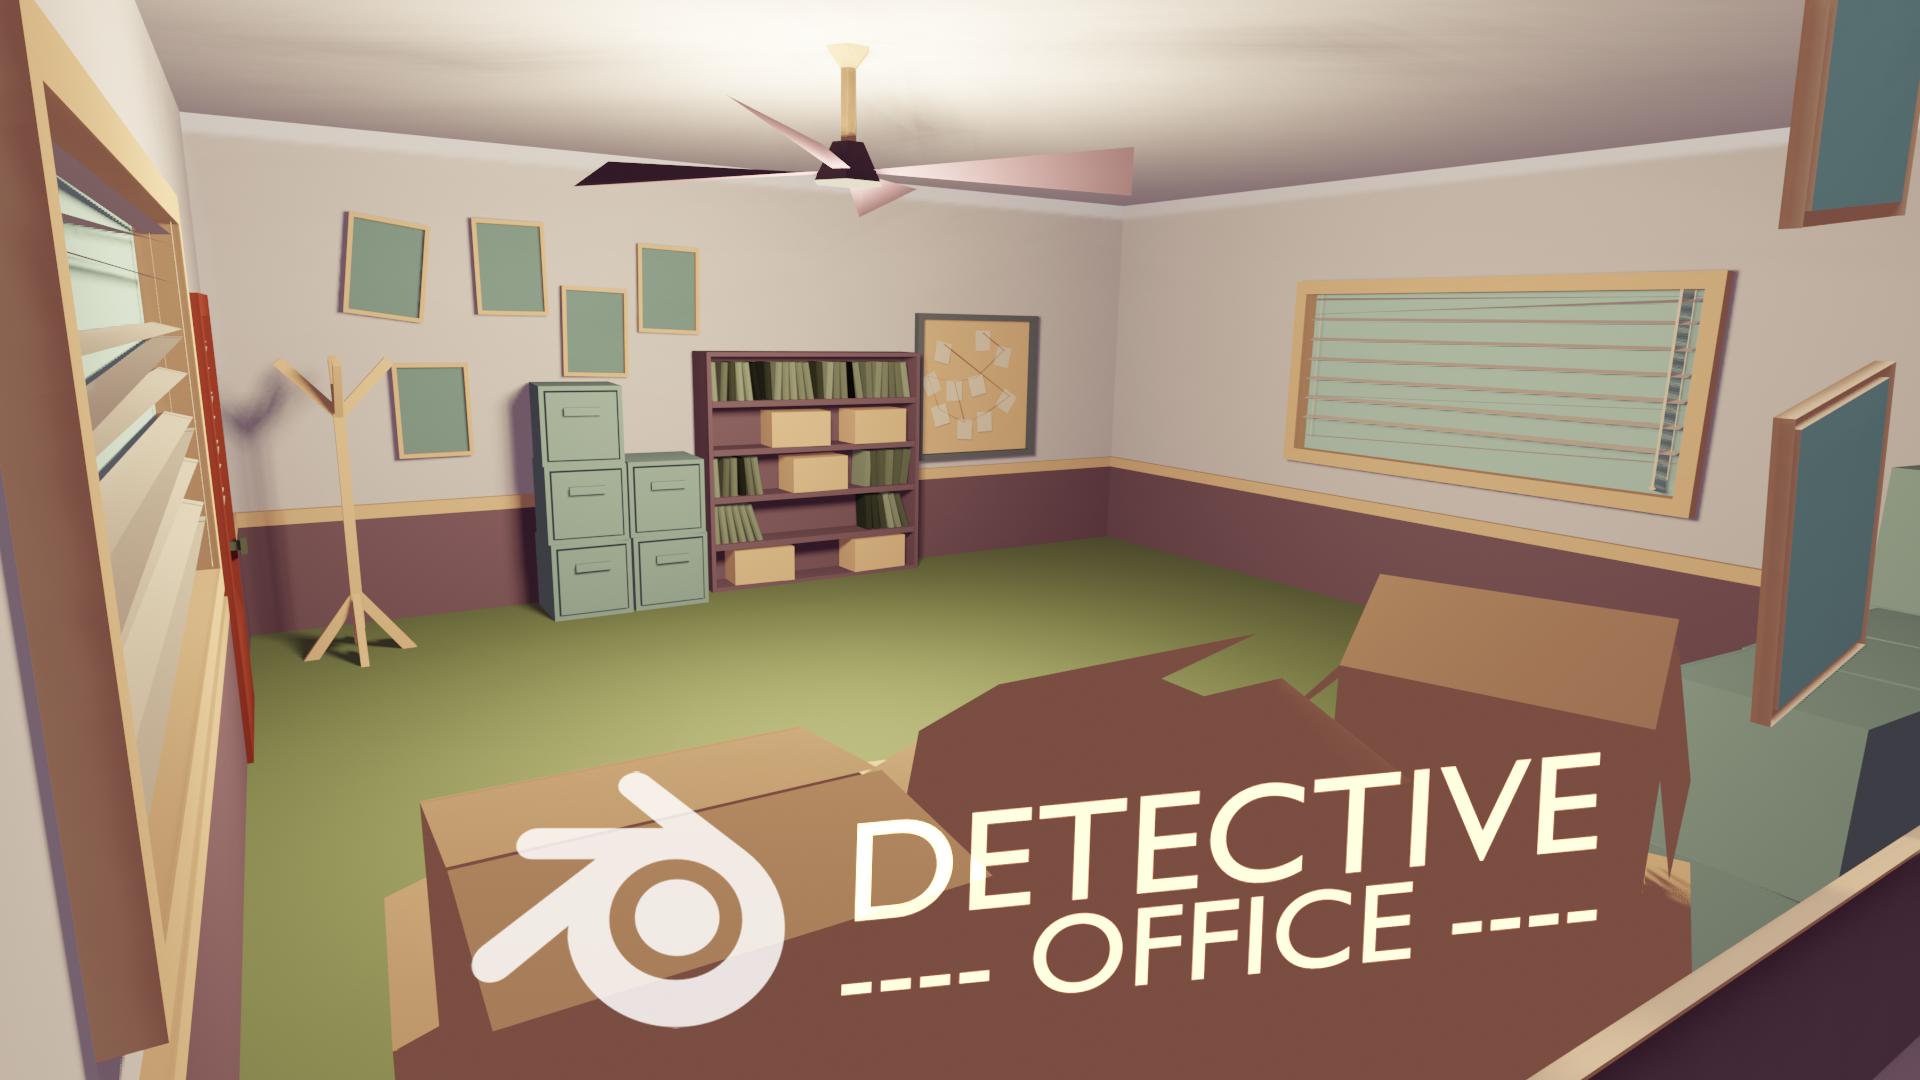 Detective office illustration